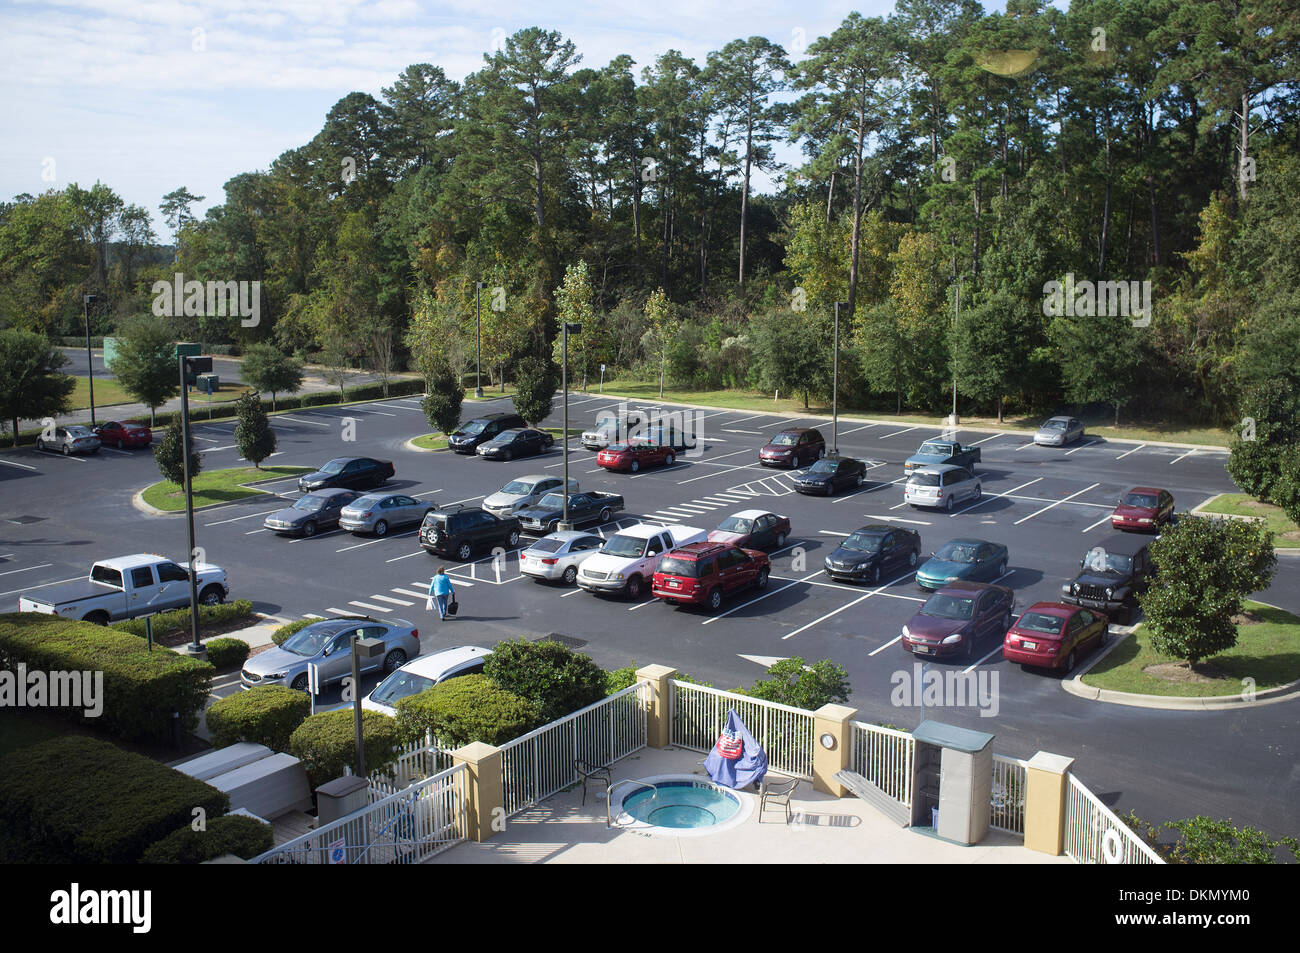 Hotel car parking lot. Tallahassee Florida USA - Stock Image